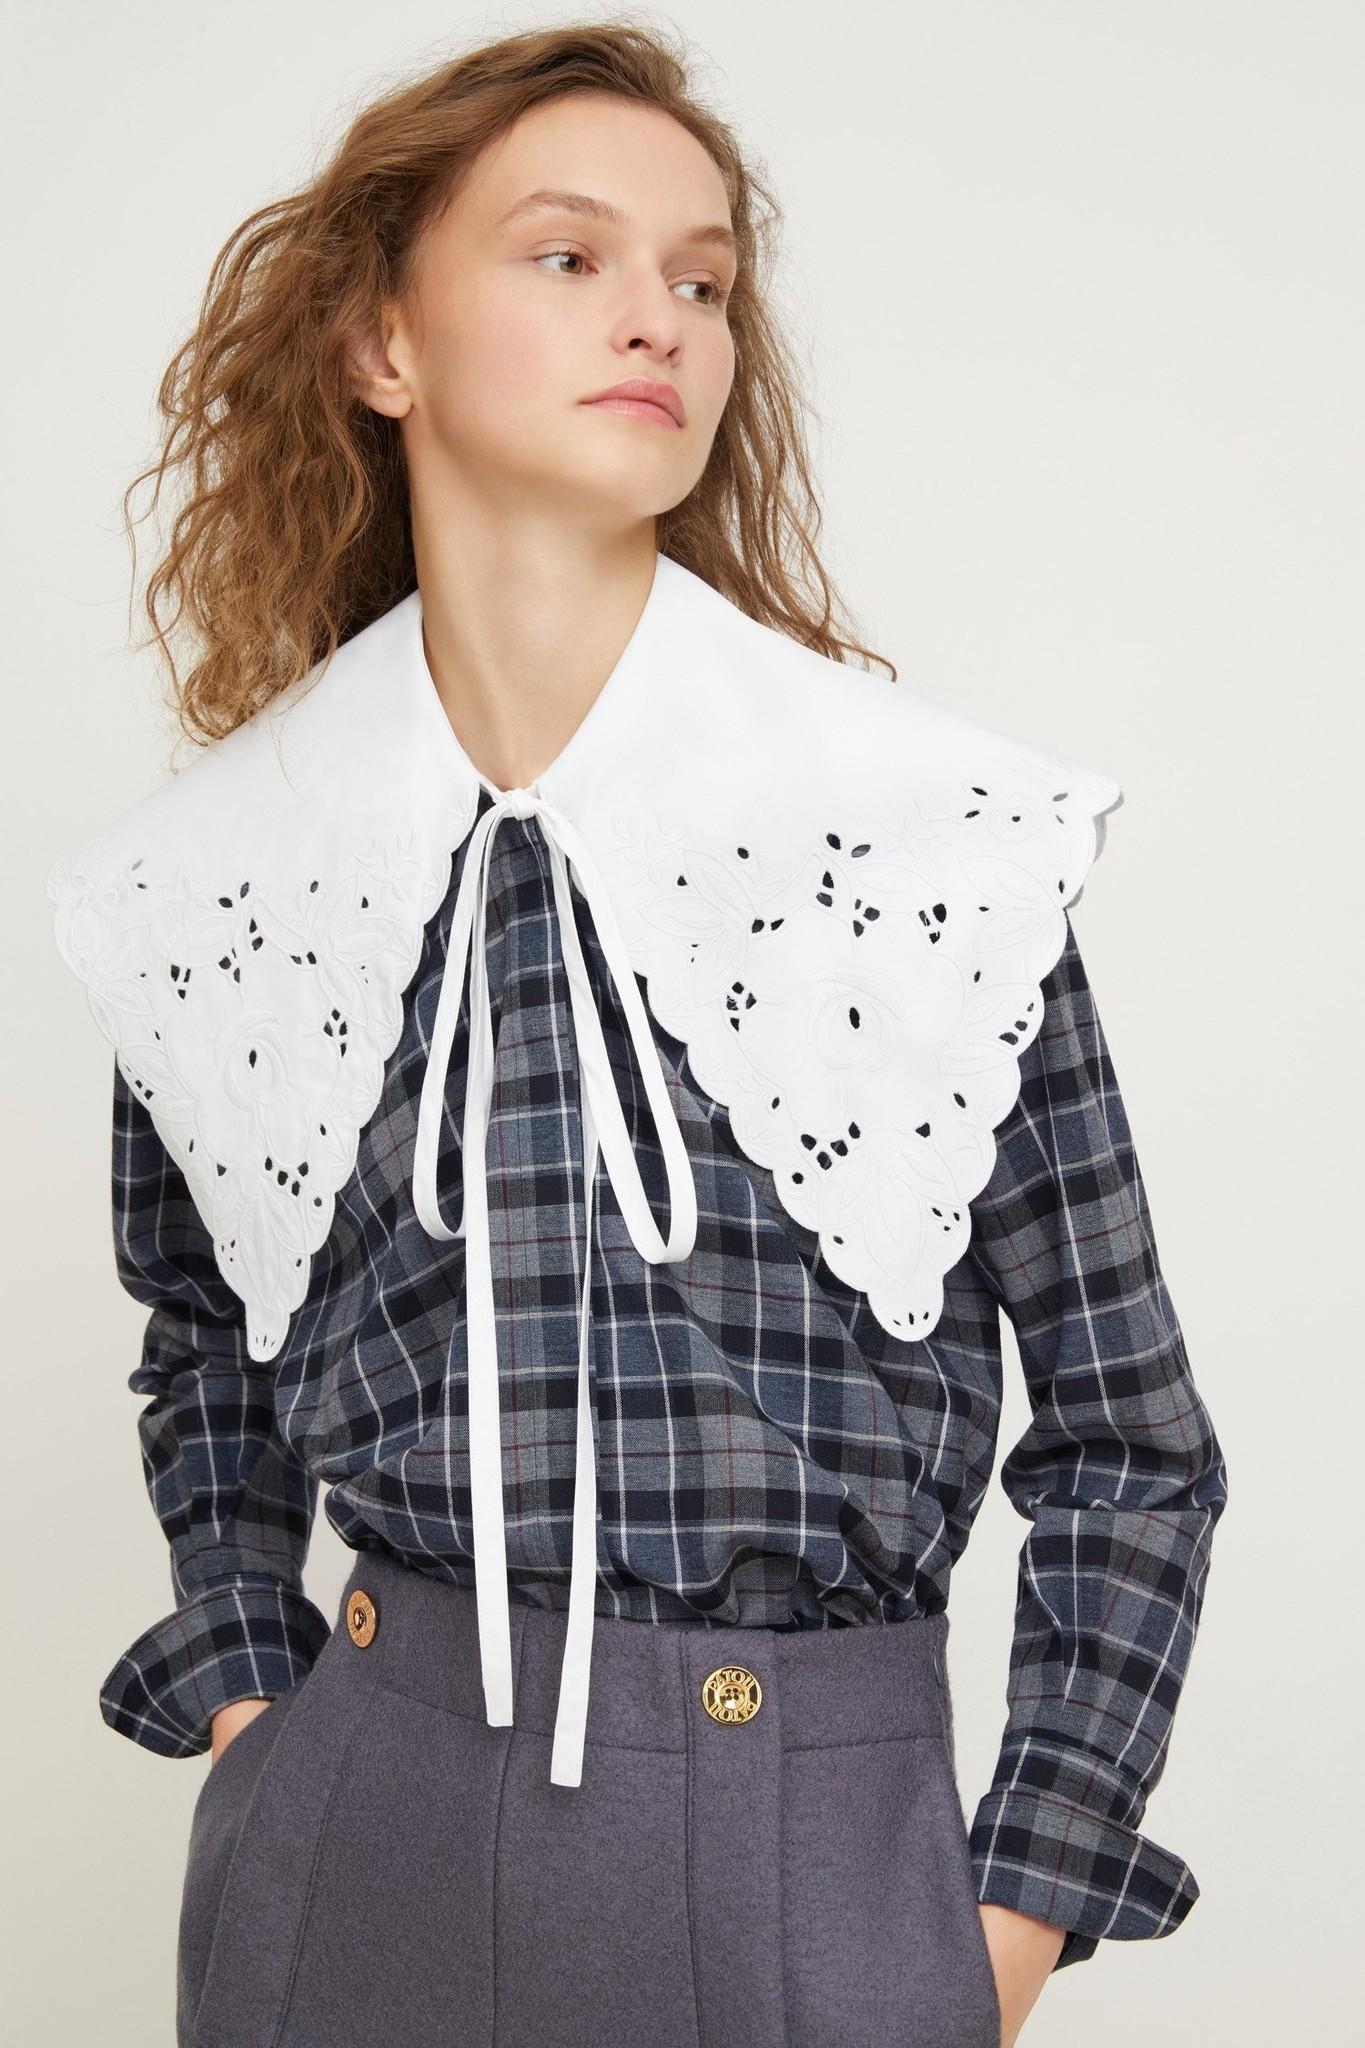 Embroidered Collar Cotton/Wool Shirt - Sz 38-1